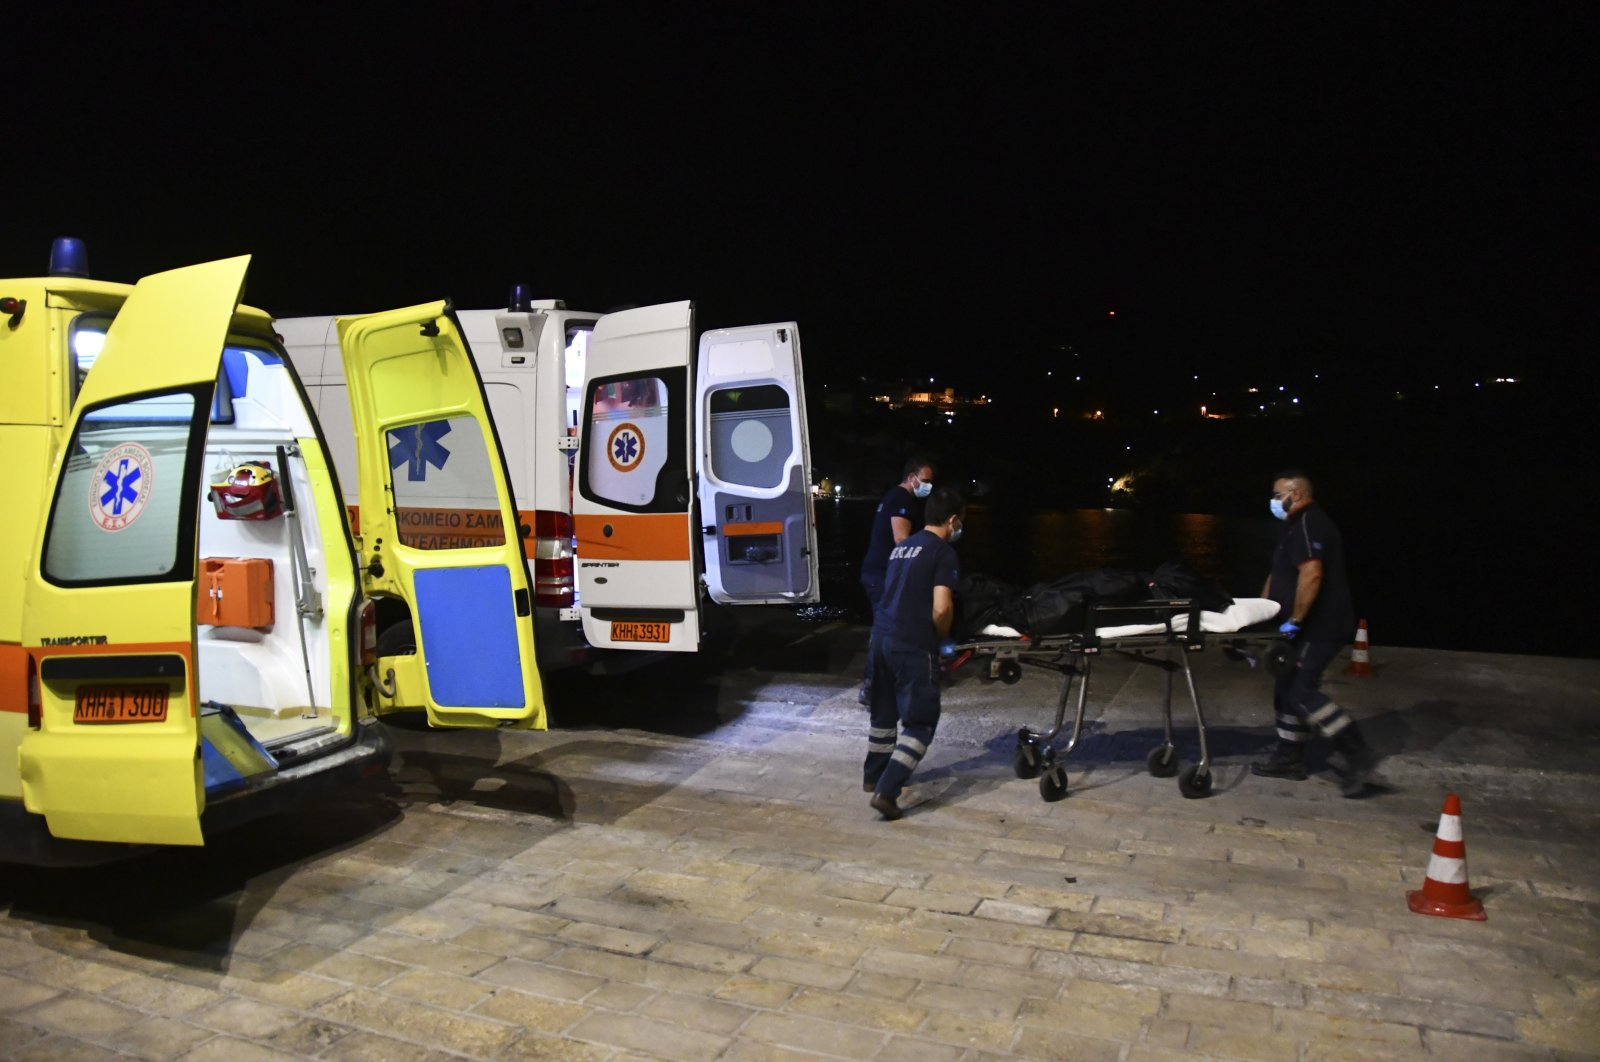 Paramedics wheel a gurney with a body at Pythagorio port, on the eastern Aegean island of Samos, Greece, Sept. 13, 2021. (AP Photo)